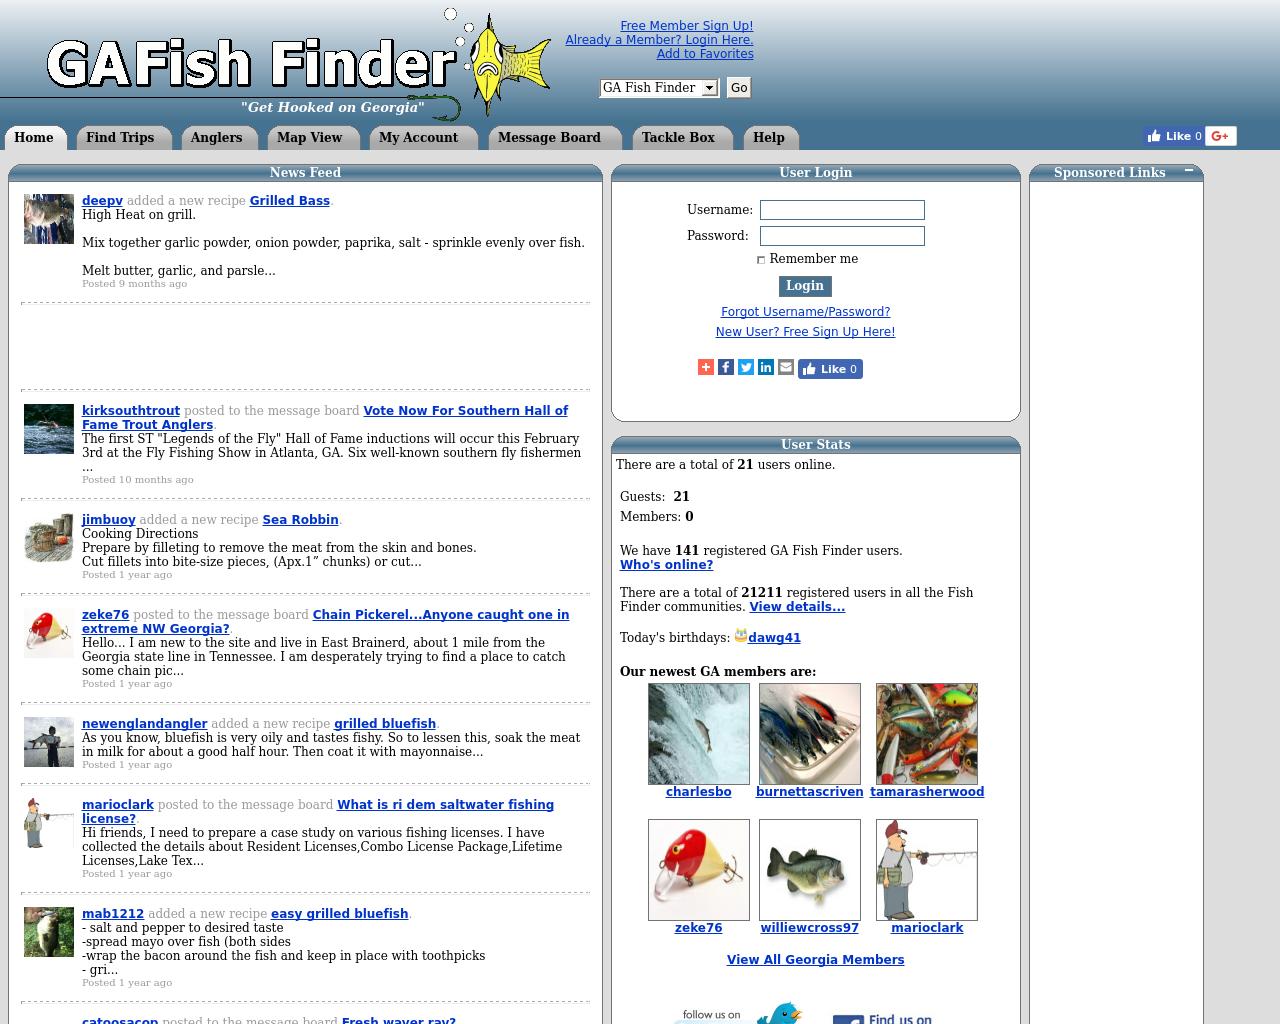 GA-Fish-Finder-Advertising-Reviews-Pricing